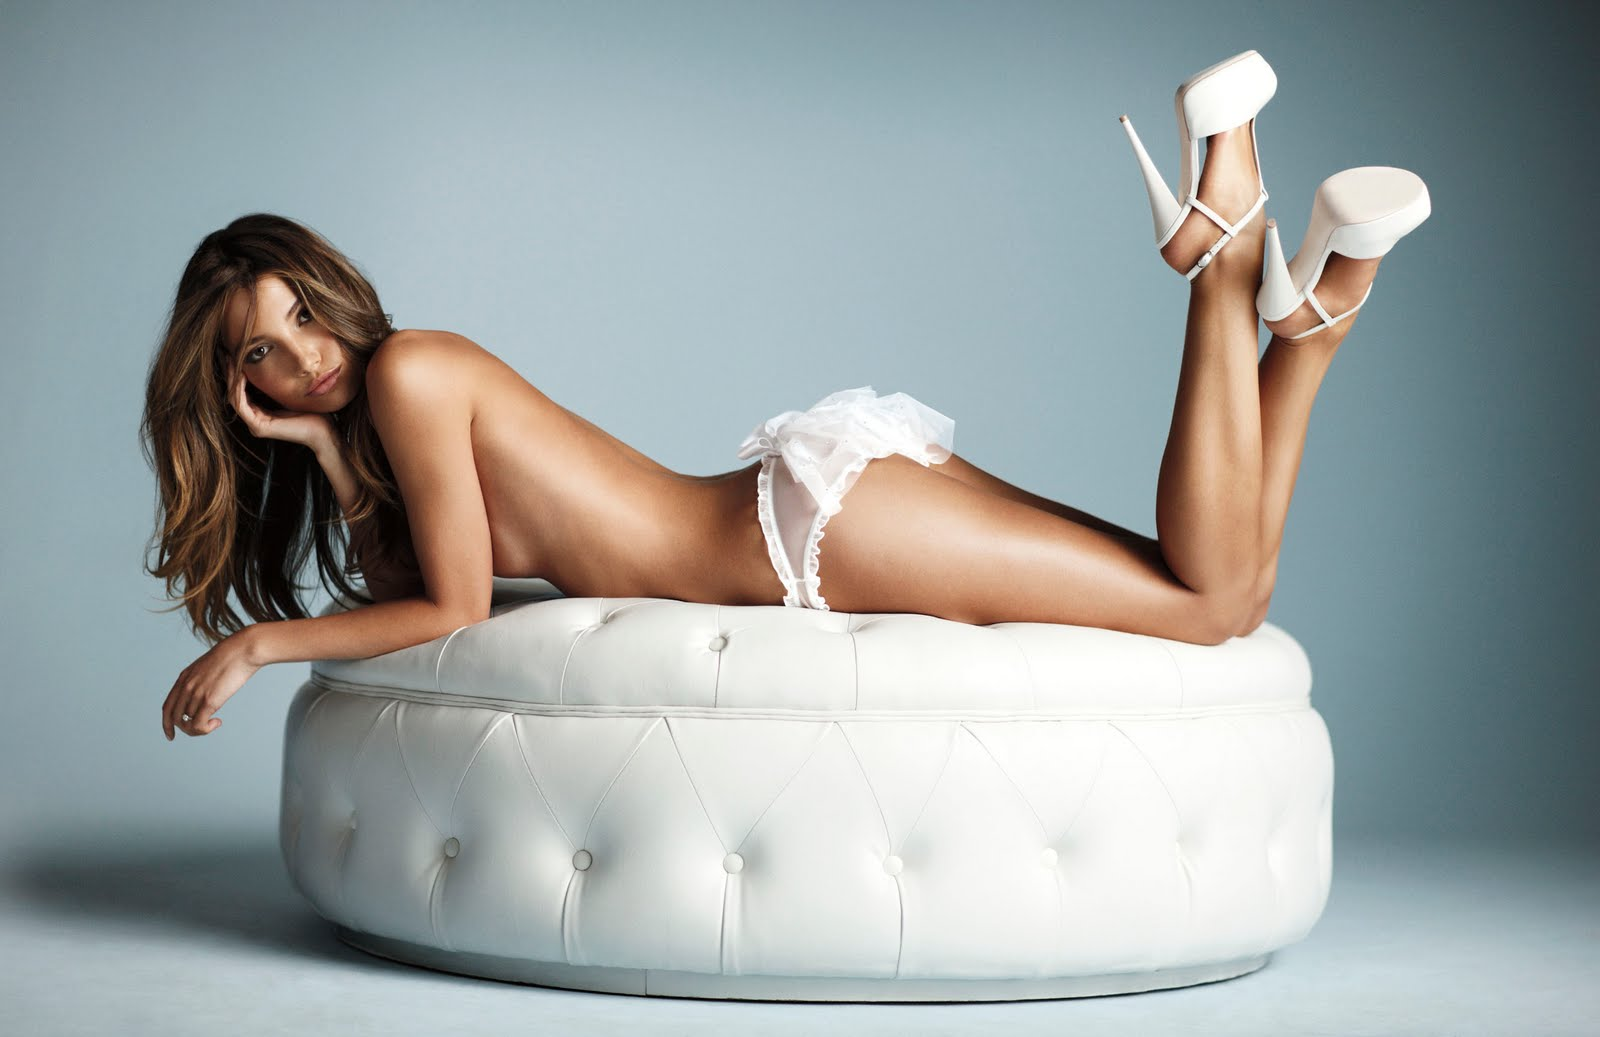 http://3.bp.blogspot.com/-CsfAAPciTWo/Tcq8IY-1AGI/AAAAAAAAAXU/SxZSu4kaASQ/s1600/bridal-2011-lily-mesh-bikini-1-victorias-secret-hi-res.jpg